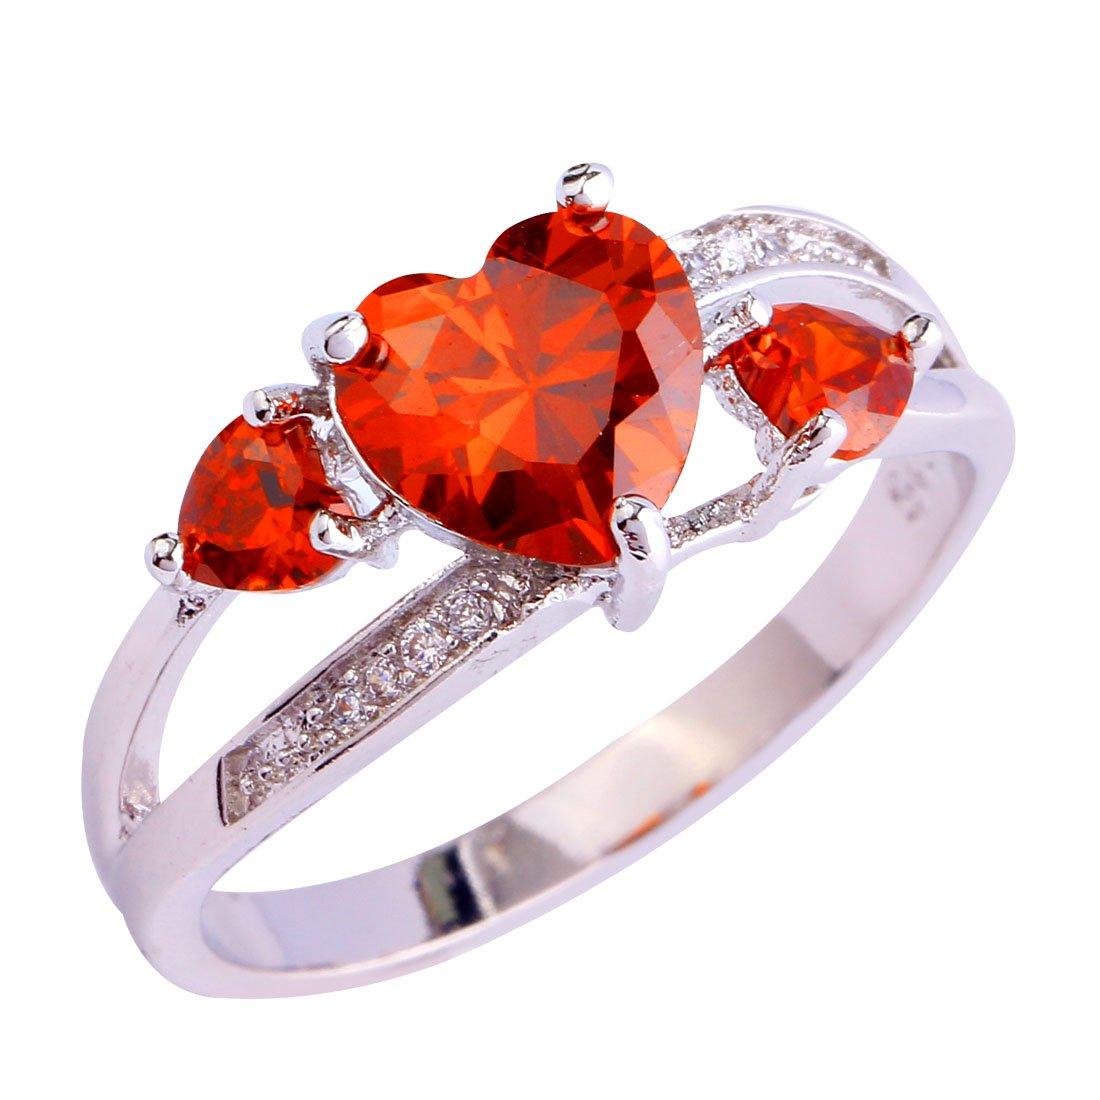 PSEZY Mystic Rainbow Topaz Amethyst rings for Women Vintage Engagement Rings Promise Rings MAE485-B485 10.0